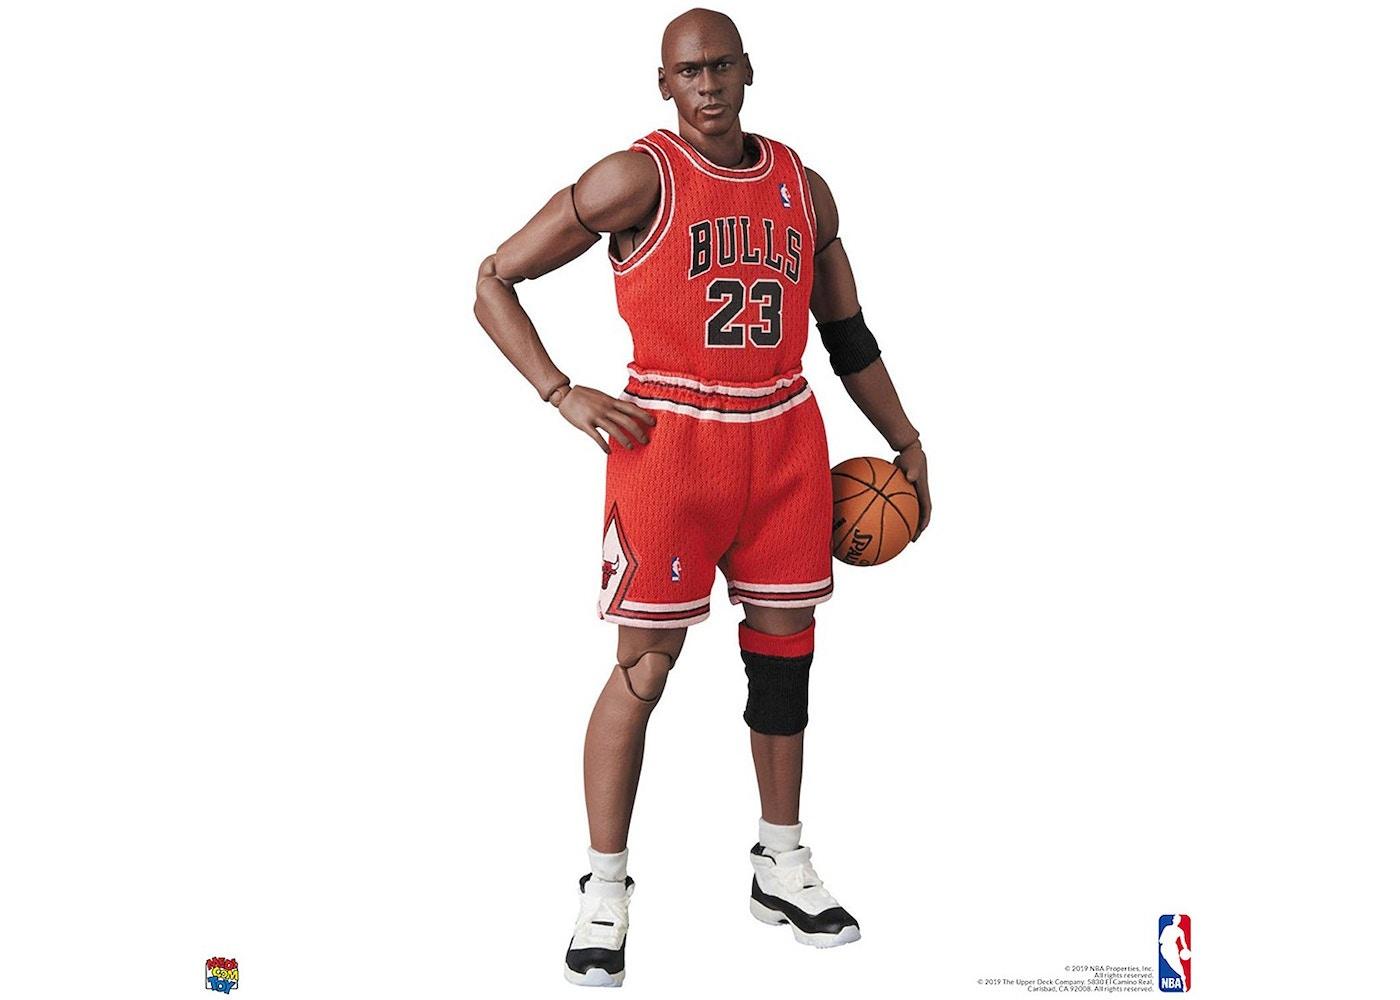 talento grava marca  Medicom Mafex NBA Chicago Bulls Michael Jordan Figure -